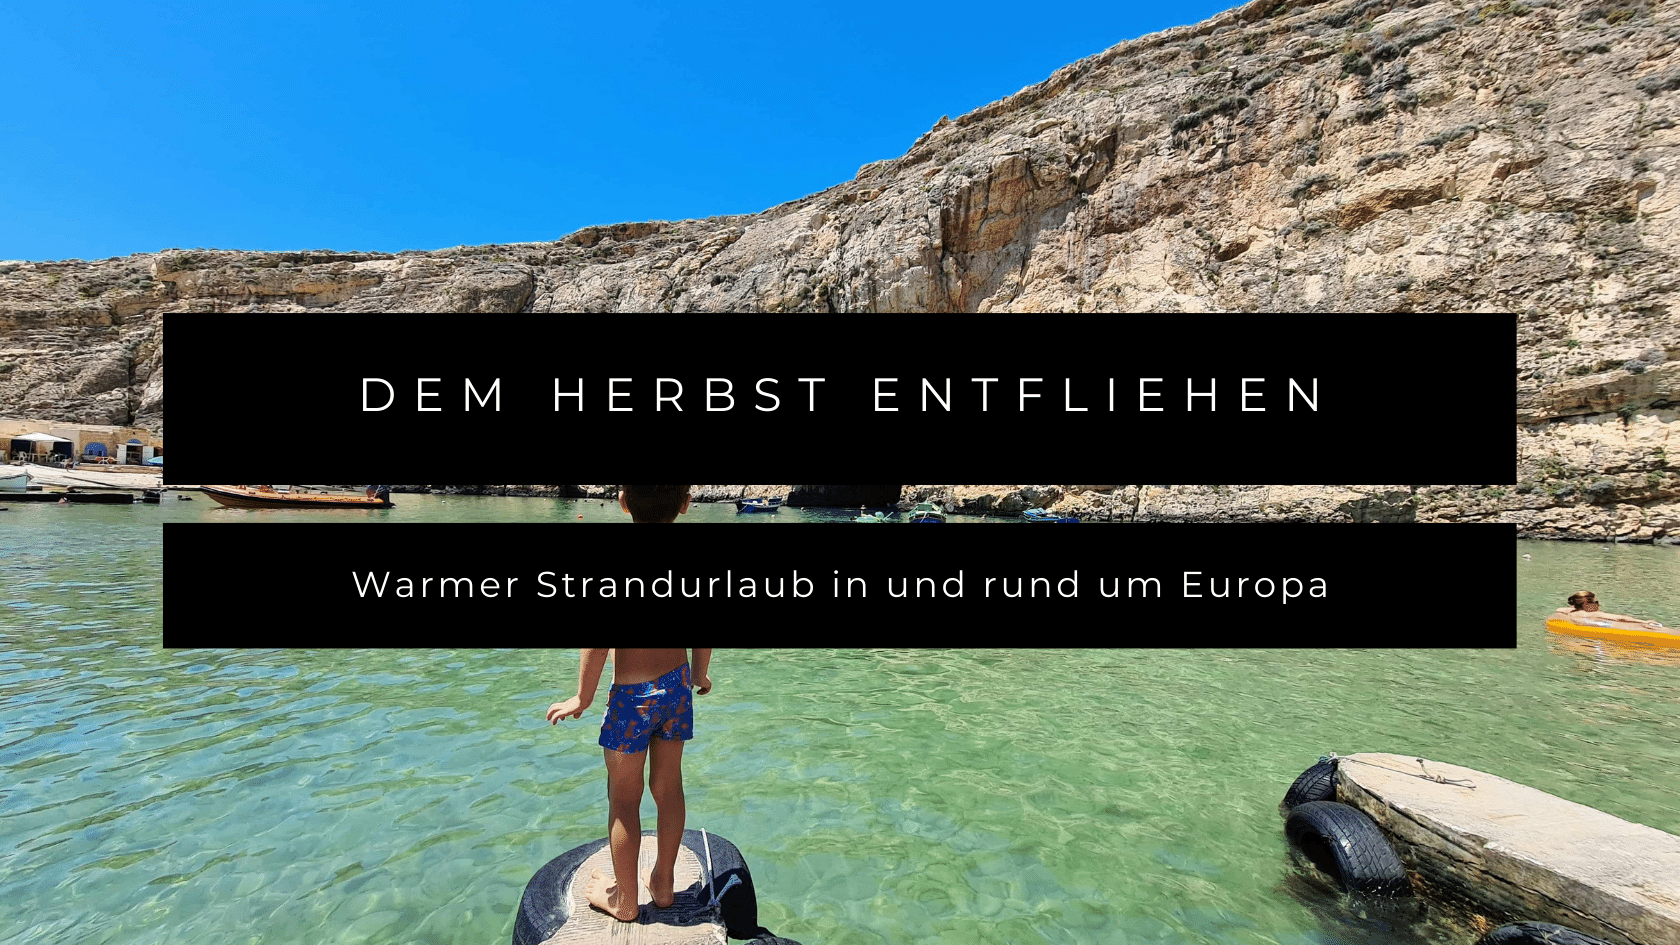 Dem Herbst entfliehen: warmer Strandurlaub in Europa